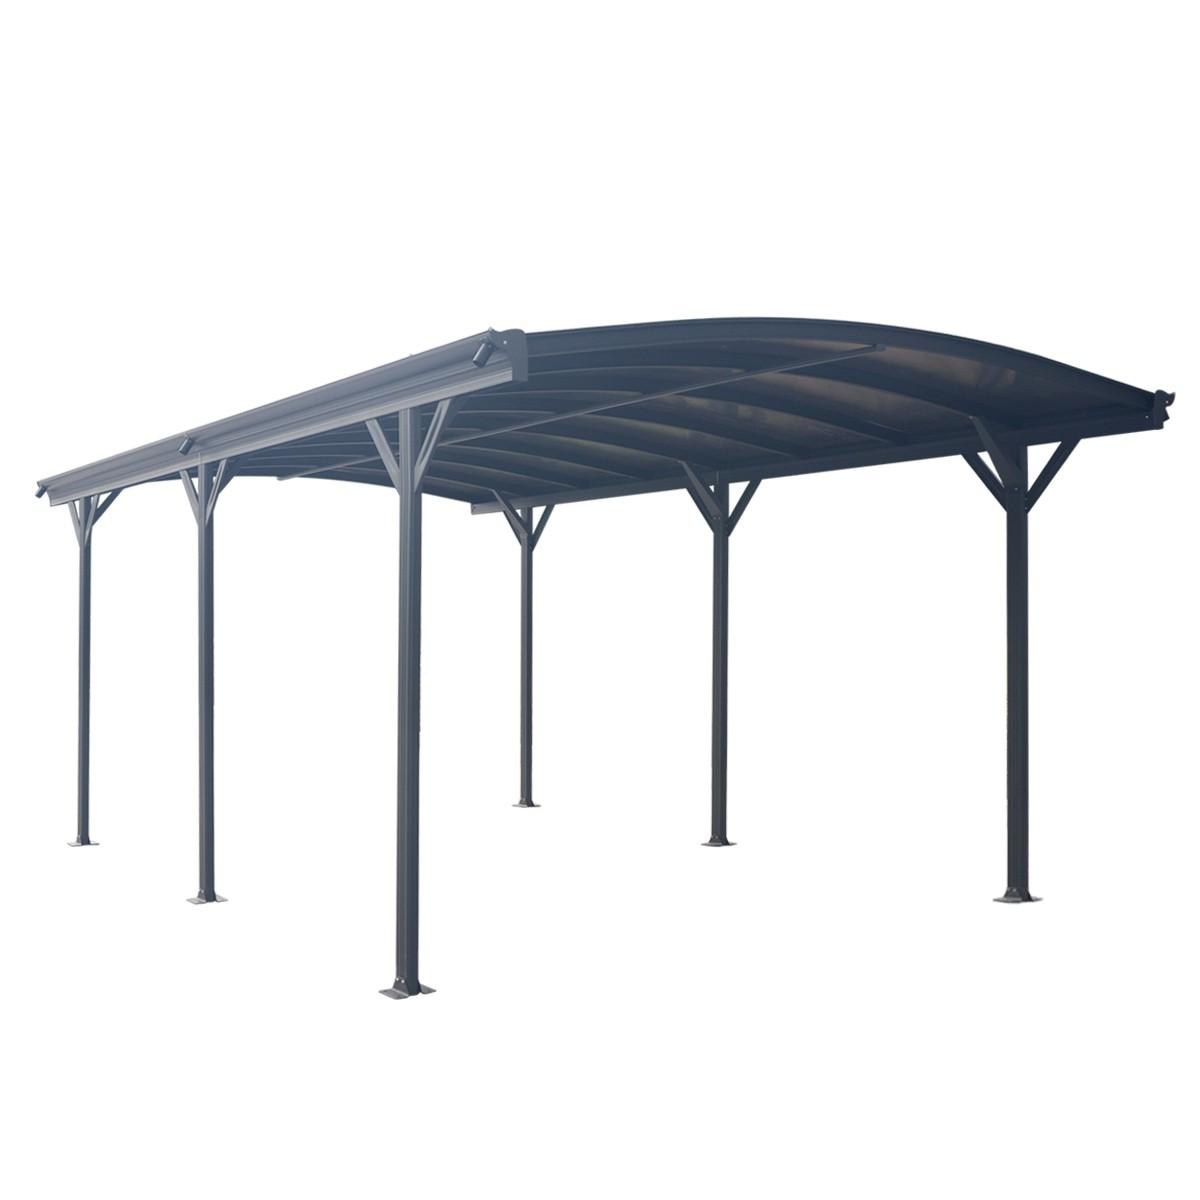 Aluminium Carport 3 X 5m Outdoor Canopy Car Port Portable